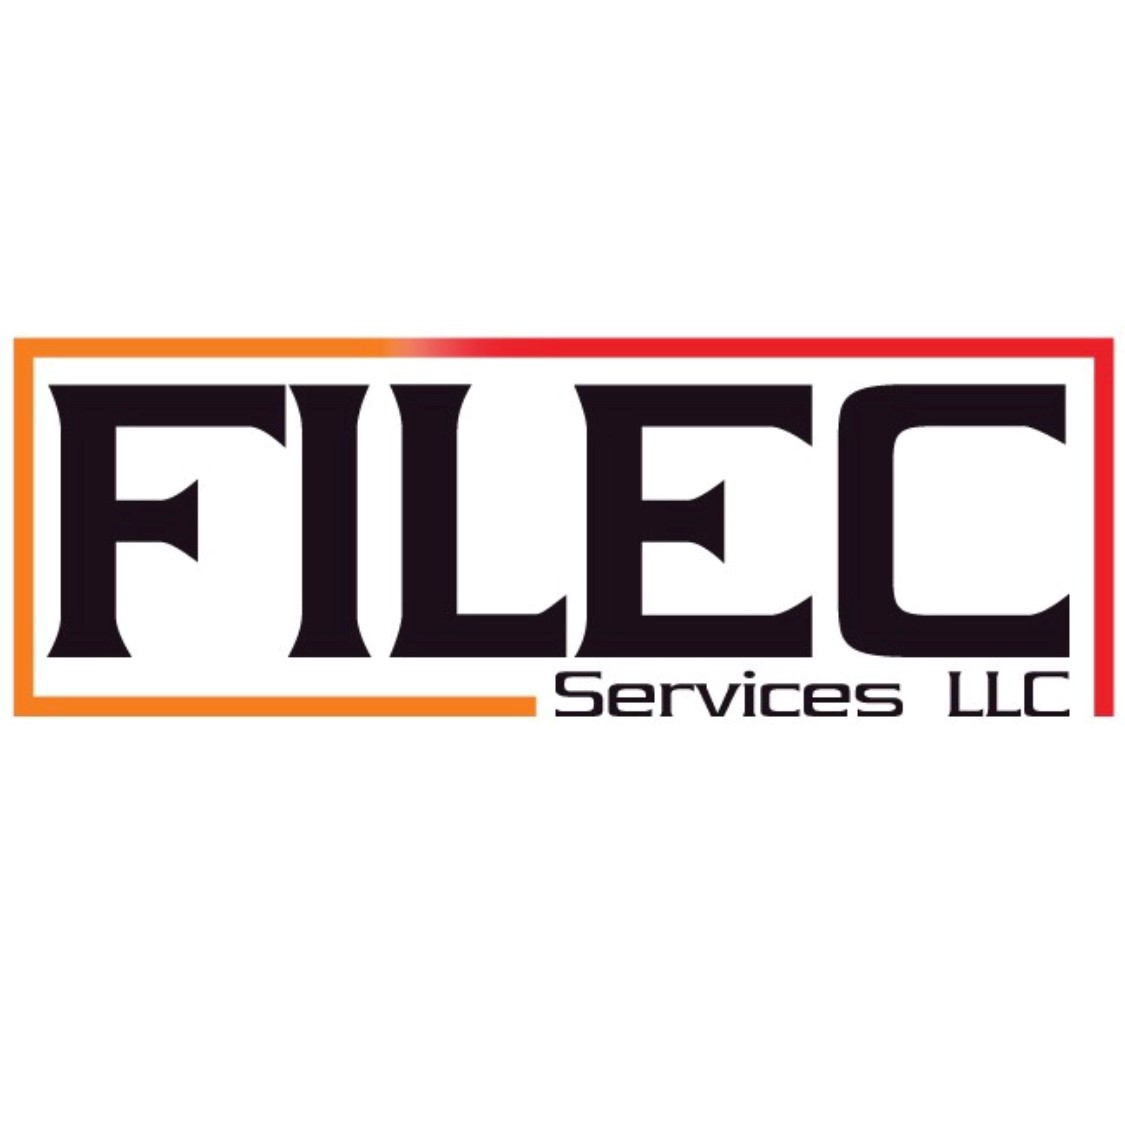 Filec Services